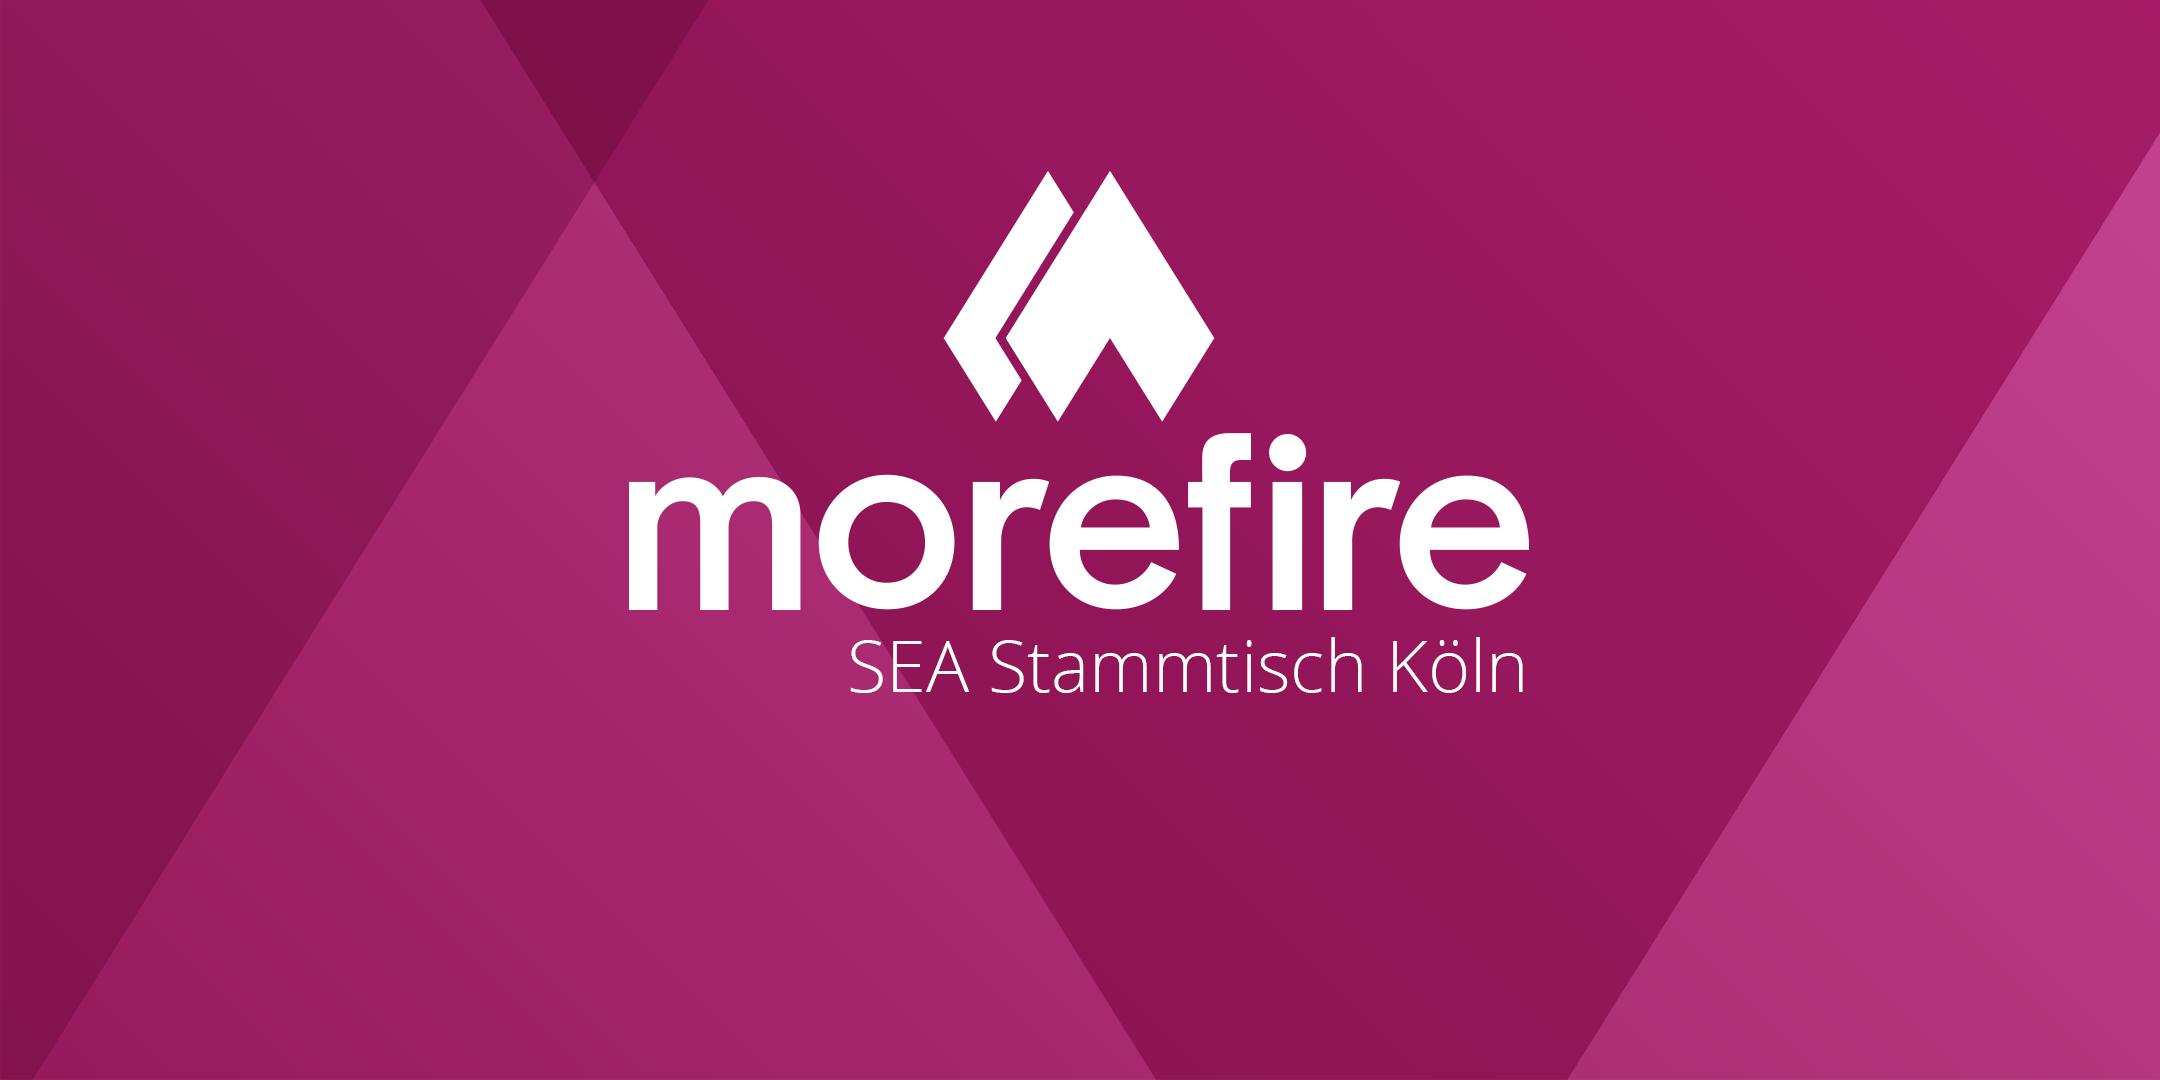 morefire SEA Stammtisch Cologne